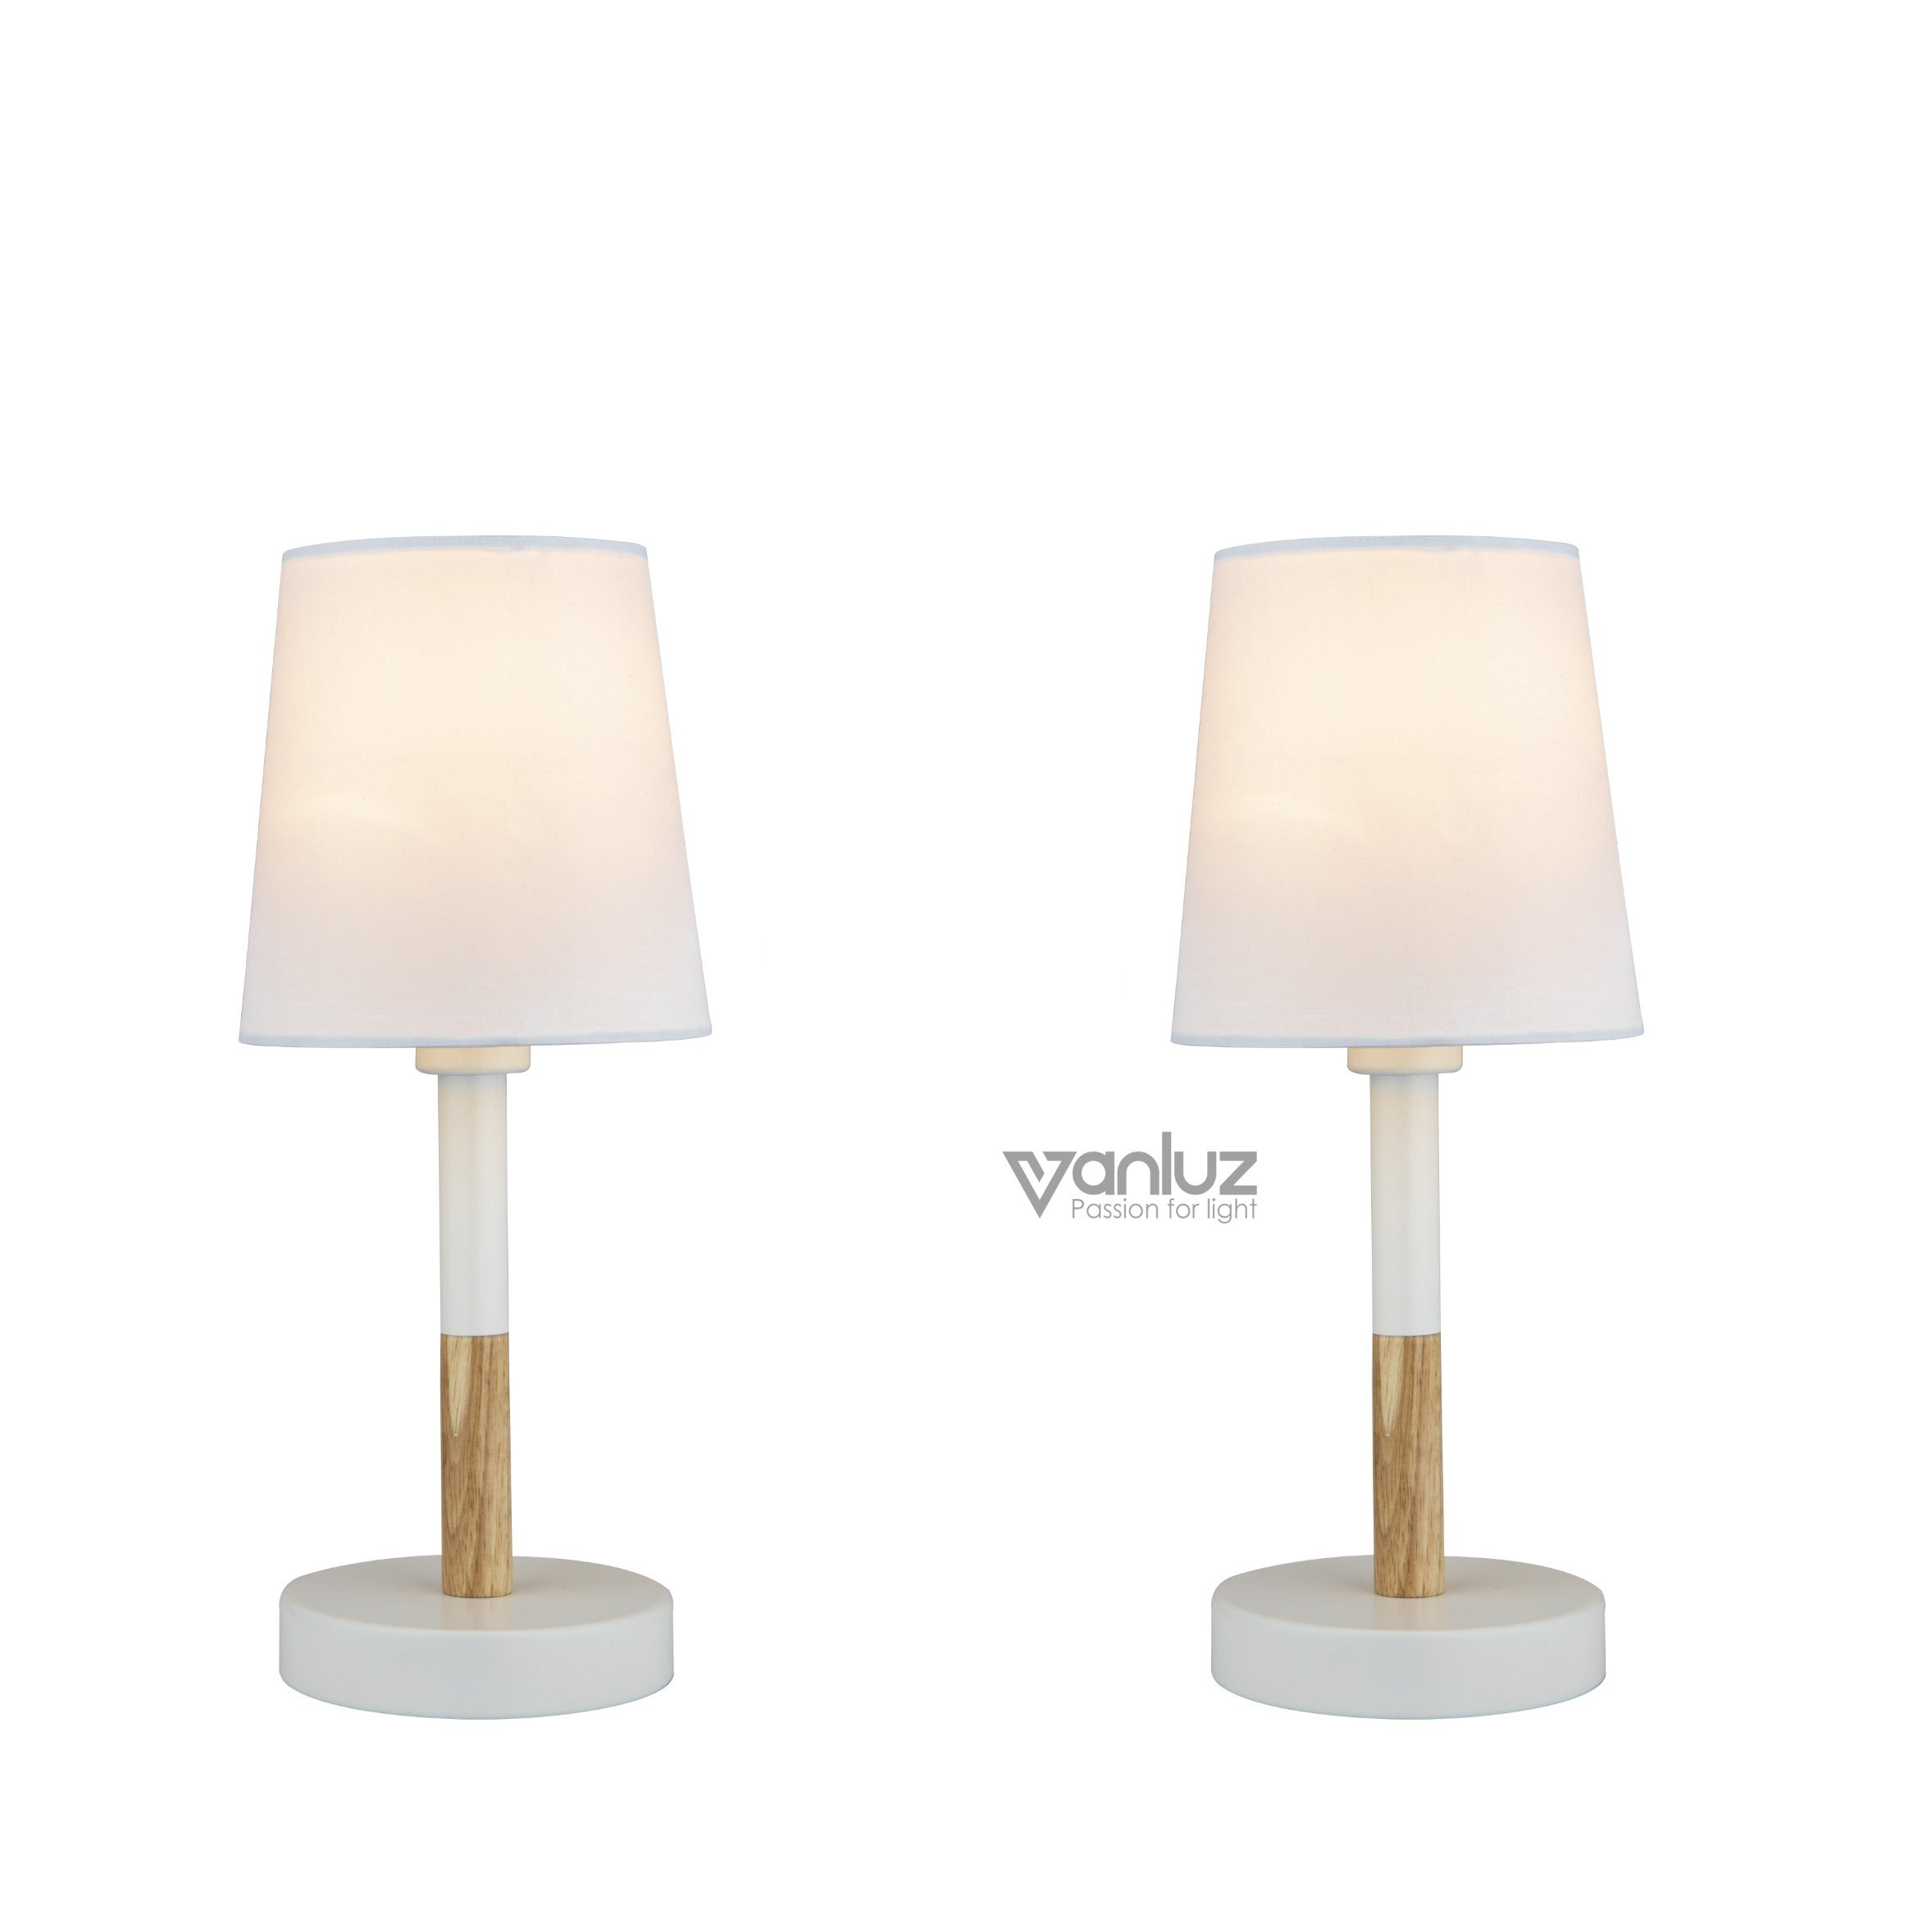 Hot Item Usb Desk Lamp E14 Bulb Minimalist Design Bedside Lamp Fabric Shade For Bedroom Living Study Room Class Ii Led Desk Lamp